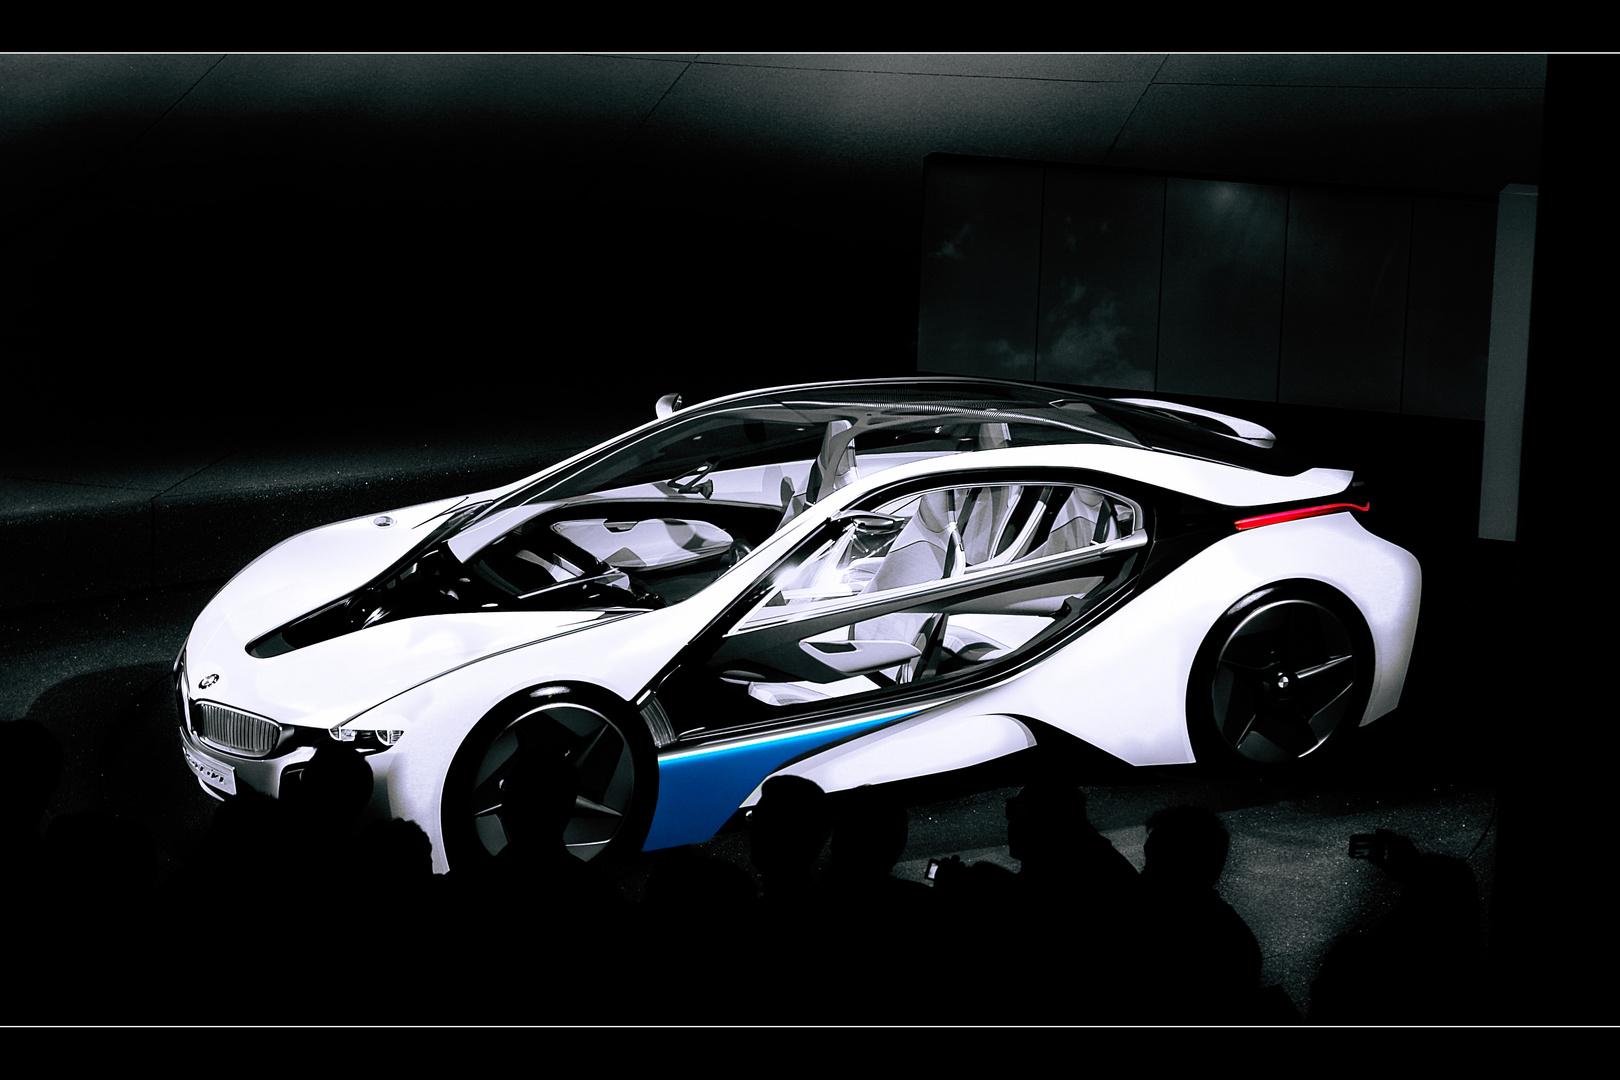 BMW Hybrid Prototyp - Vision EfficientDynamics